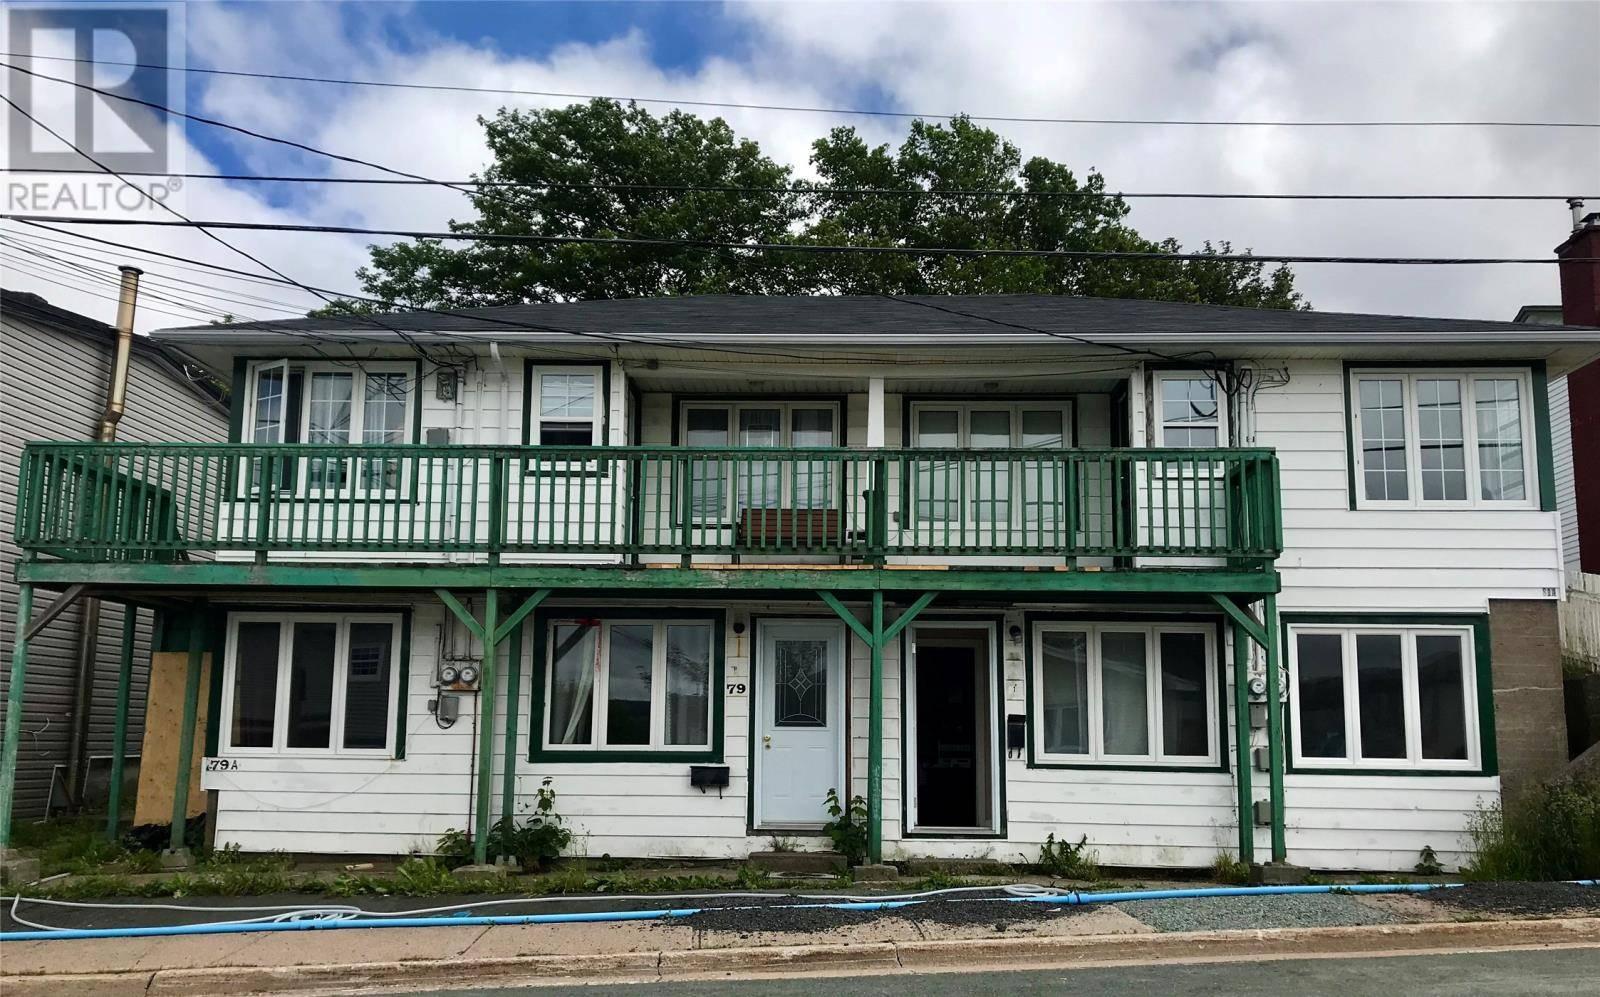 Townhouse for sale at 79 Goodridge St St. John's Newfoundland - MLS: 1210015